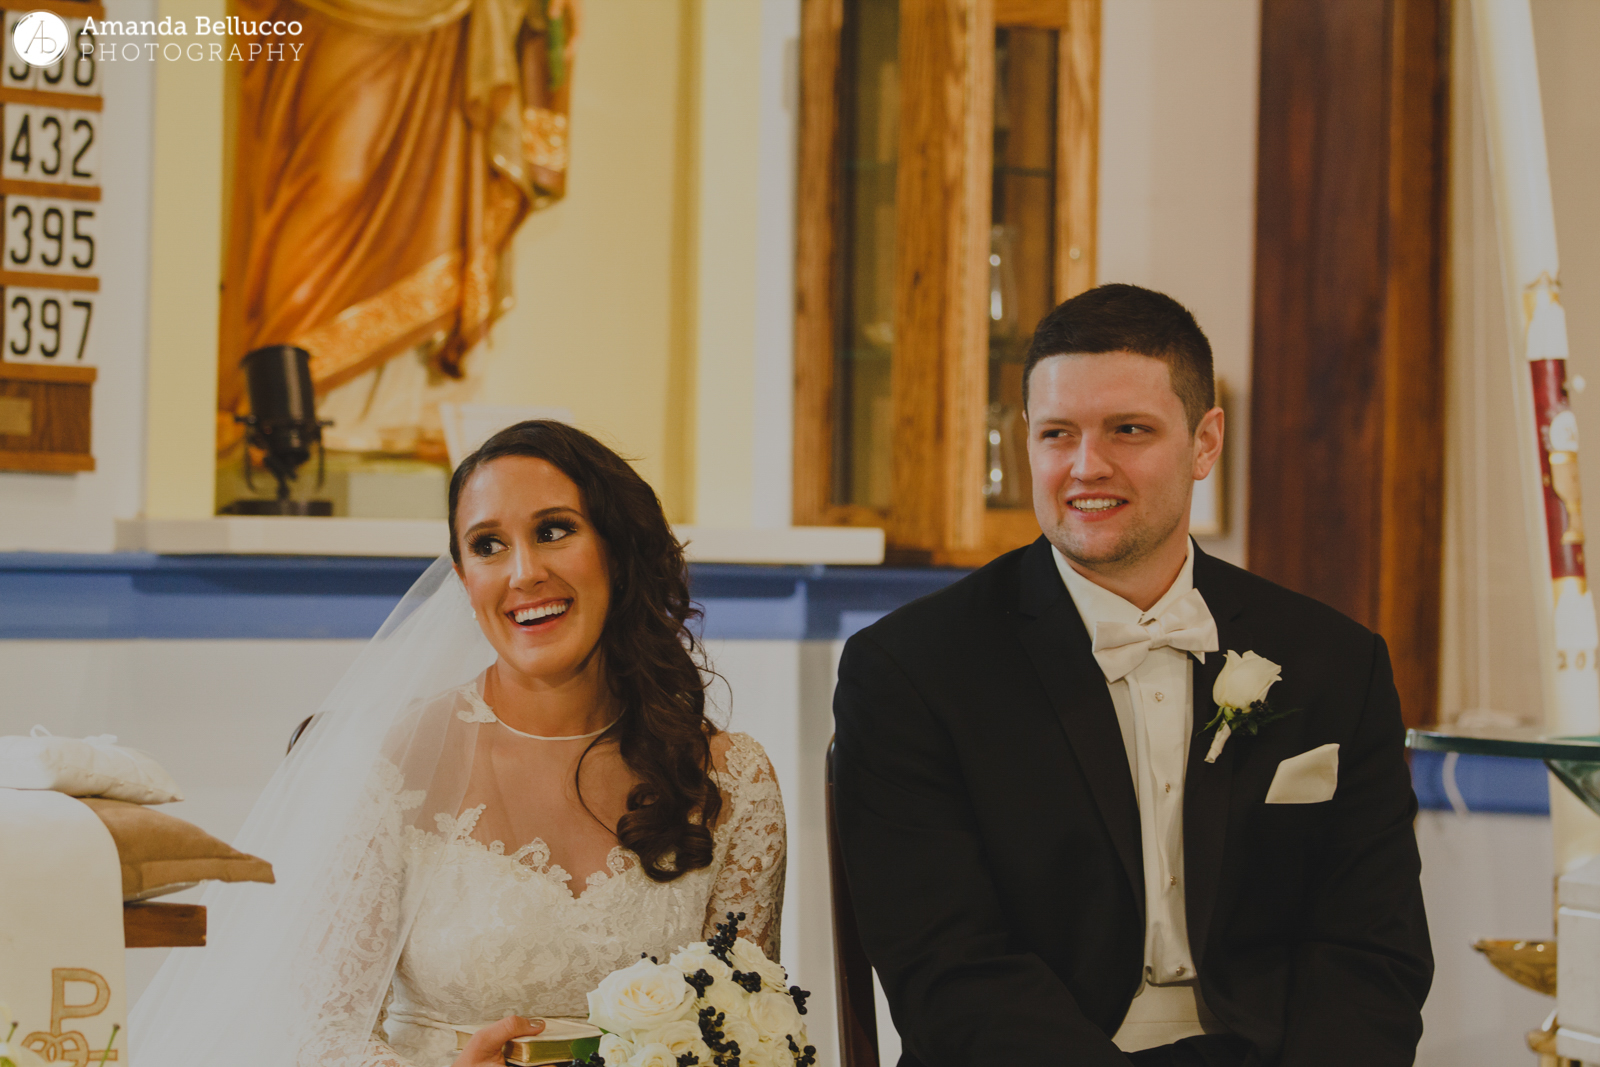 syracuse-rochester-fine-art-wedding-photographer-37.JPG